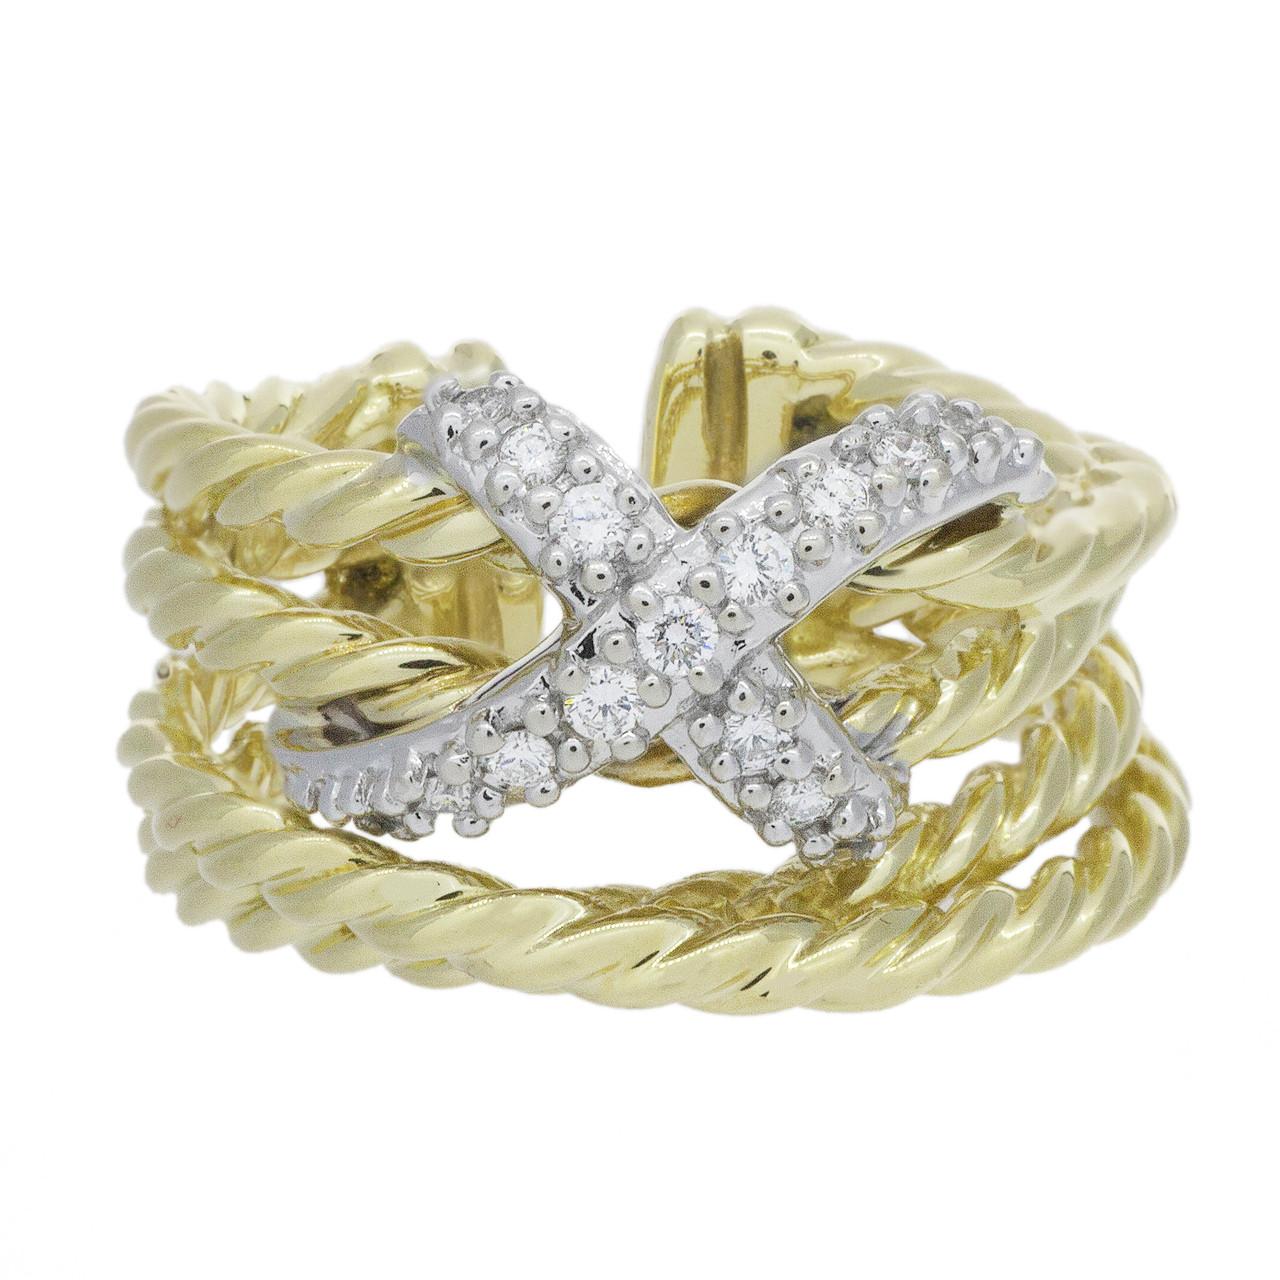 e140513f9 David Yurman 18K & Diamond X Crossover Ring - modaselle